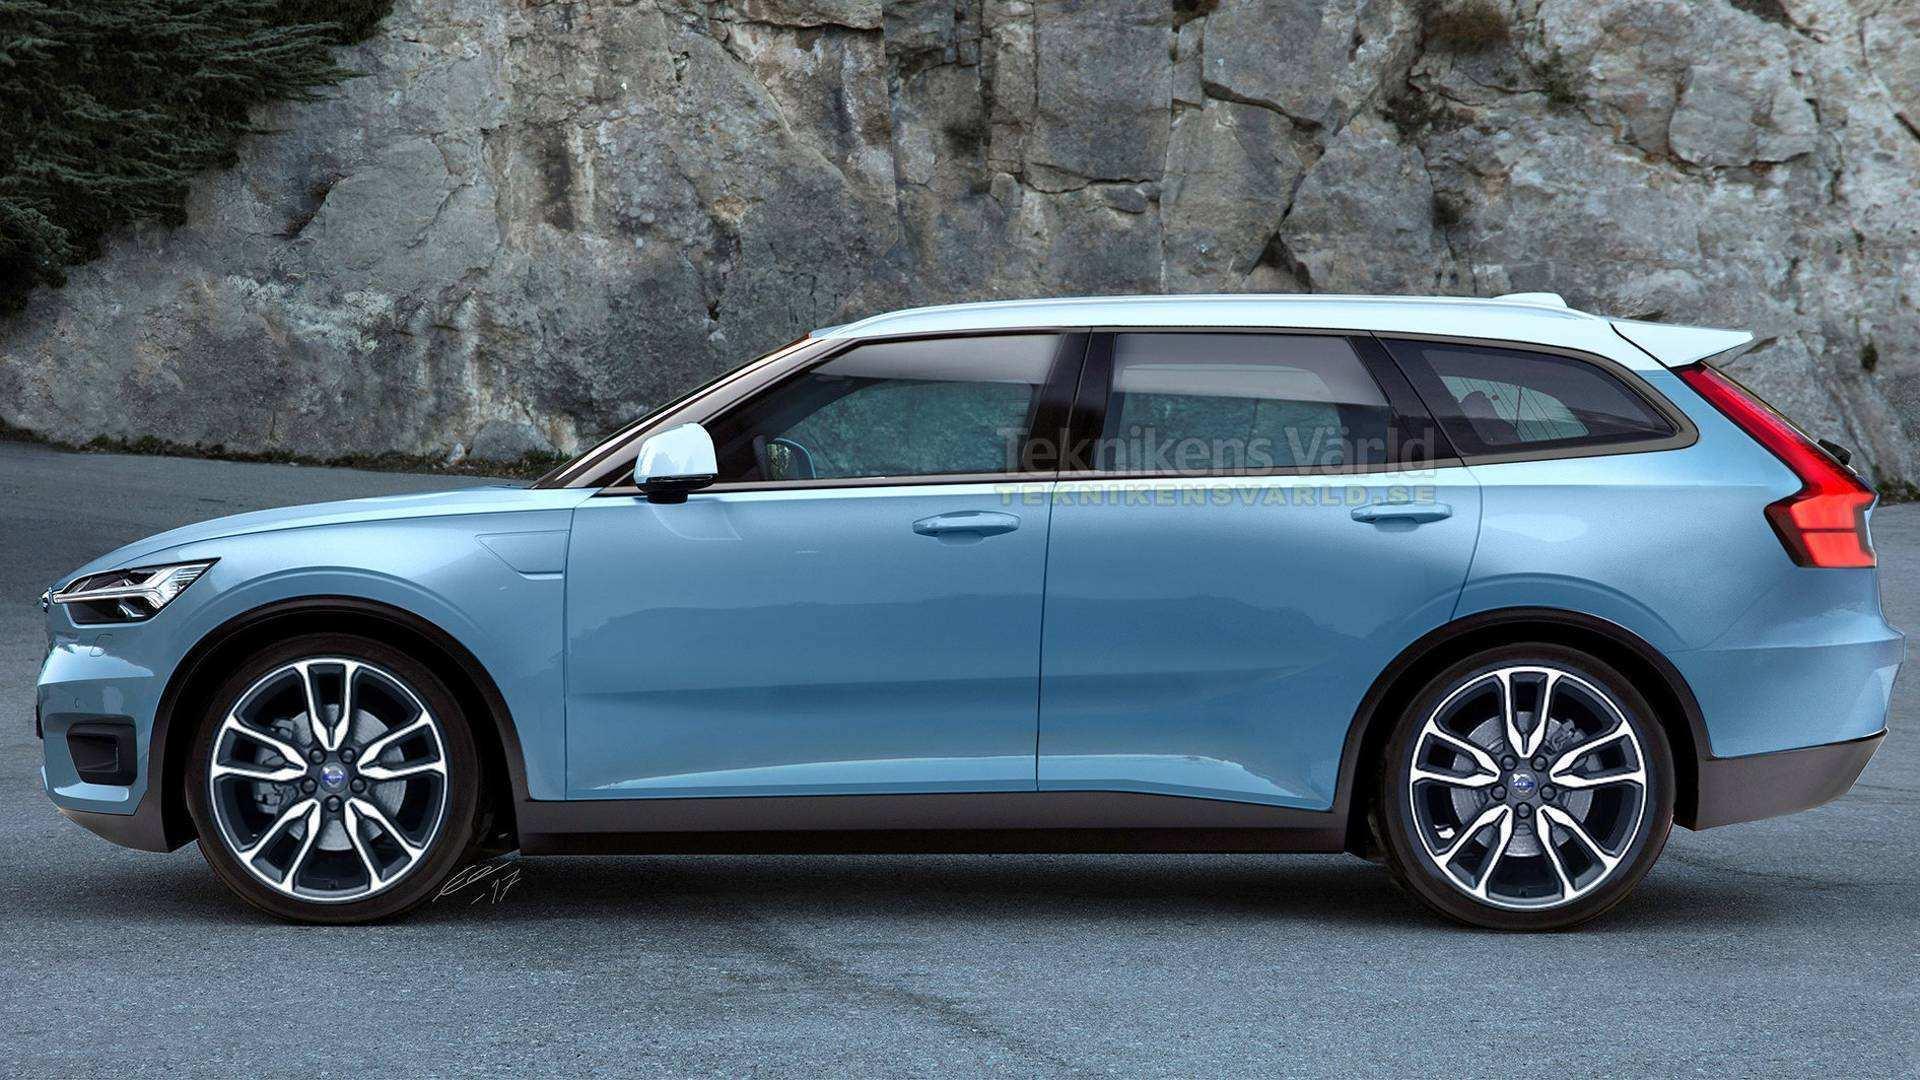 75 New 2020 Volvo Interior with 2020 Volvo